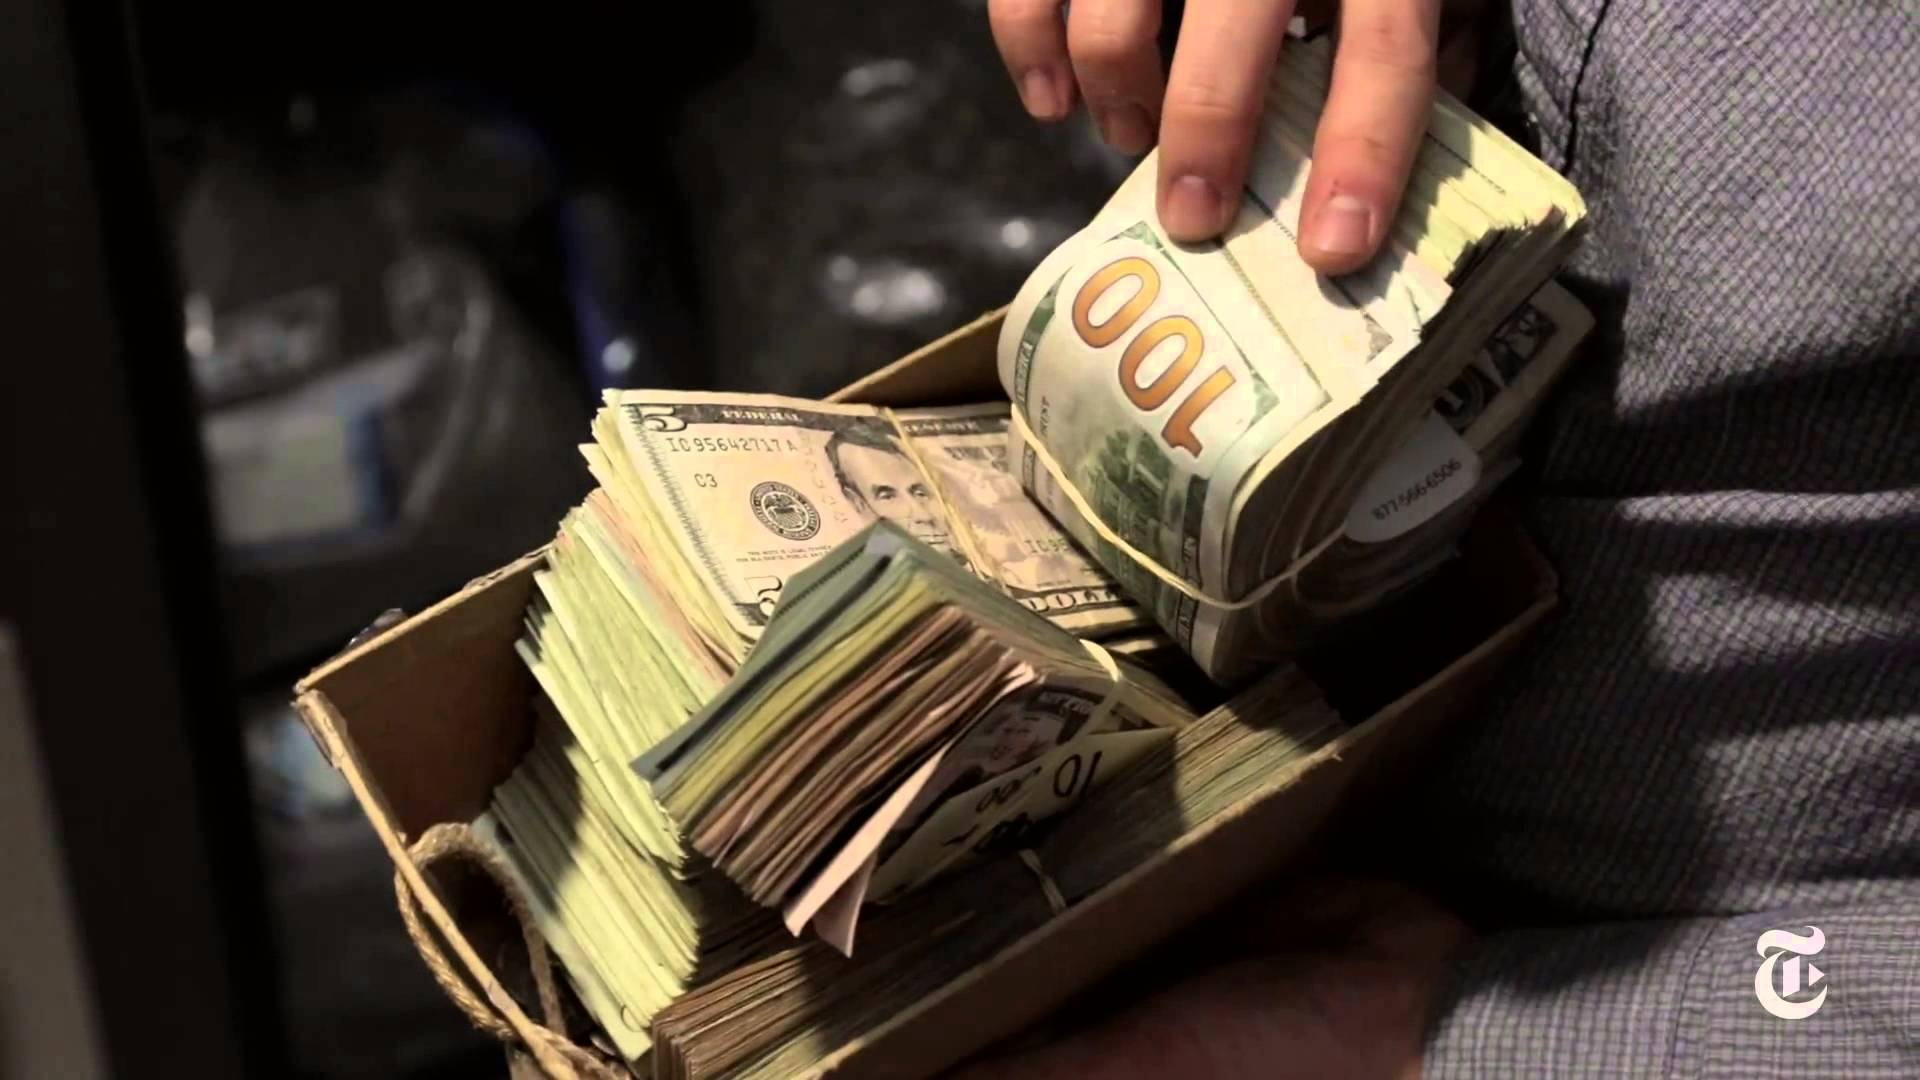 Guns Drugs And Money